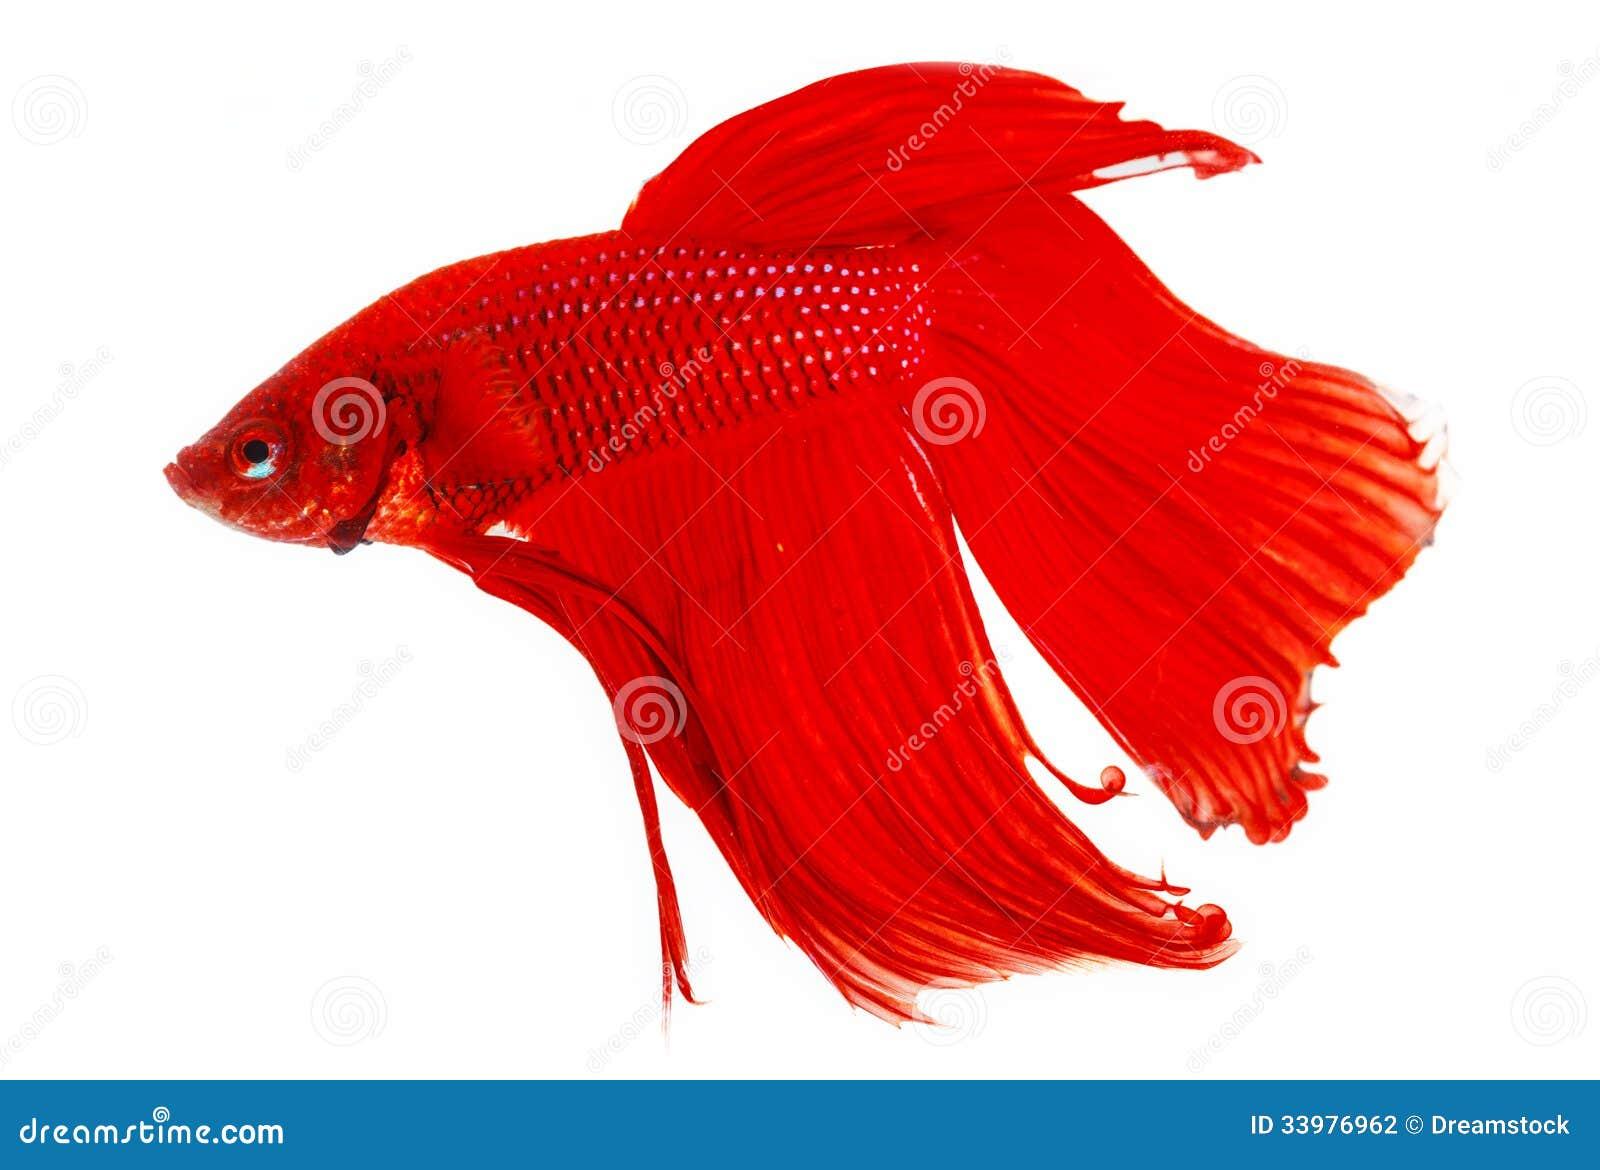 Roter siamesischer kampffisch stockfotografie bild 33976962 for Siamesischer kampffisch